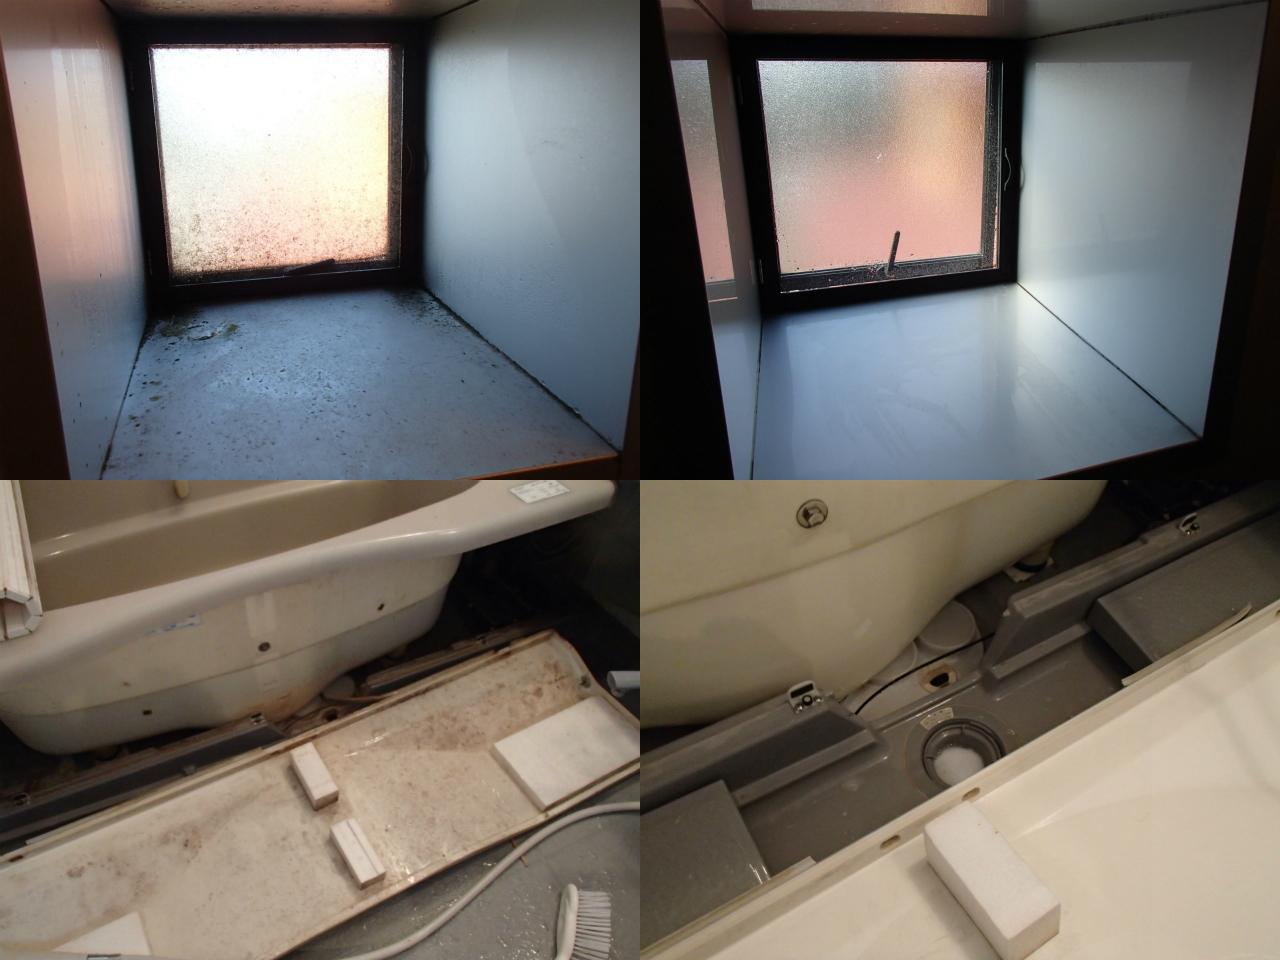 http://ajras.net/images/130124-bathroom2.jpg